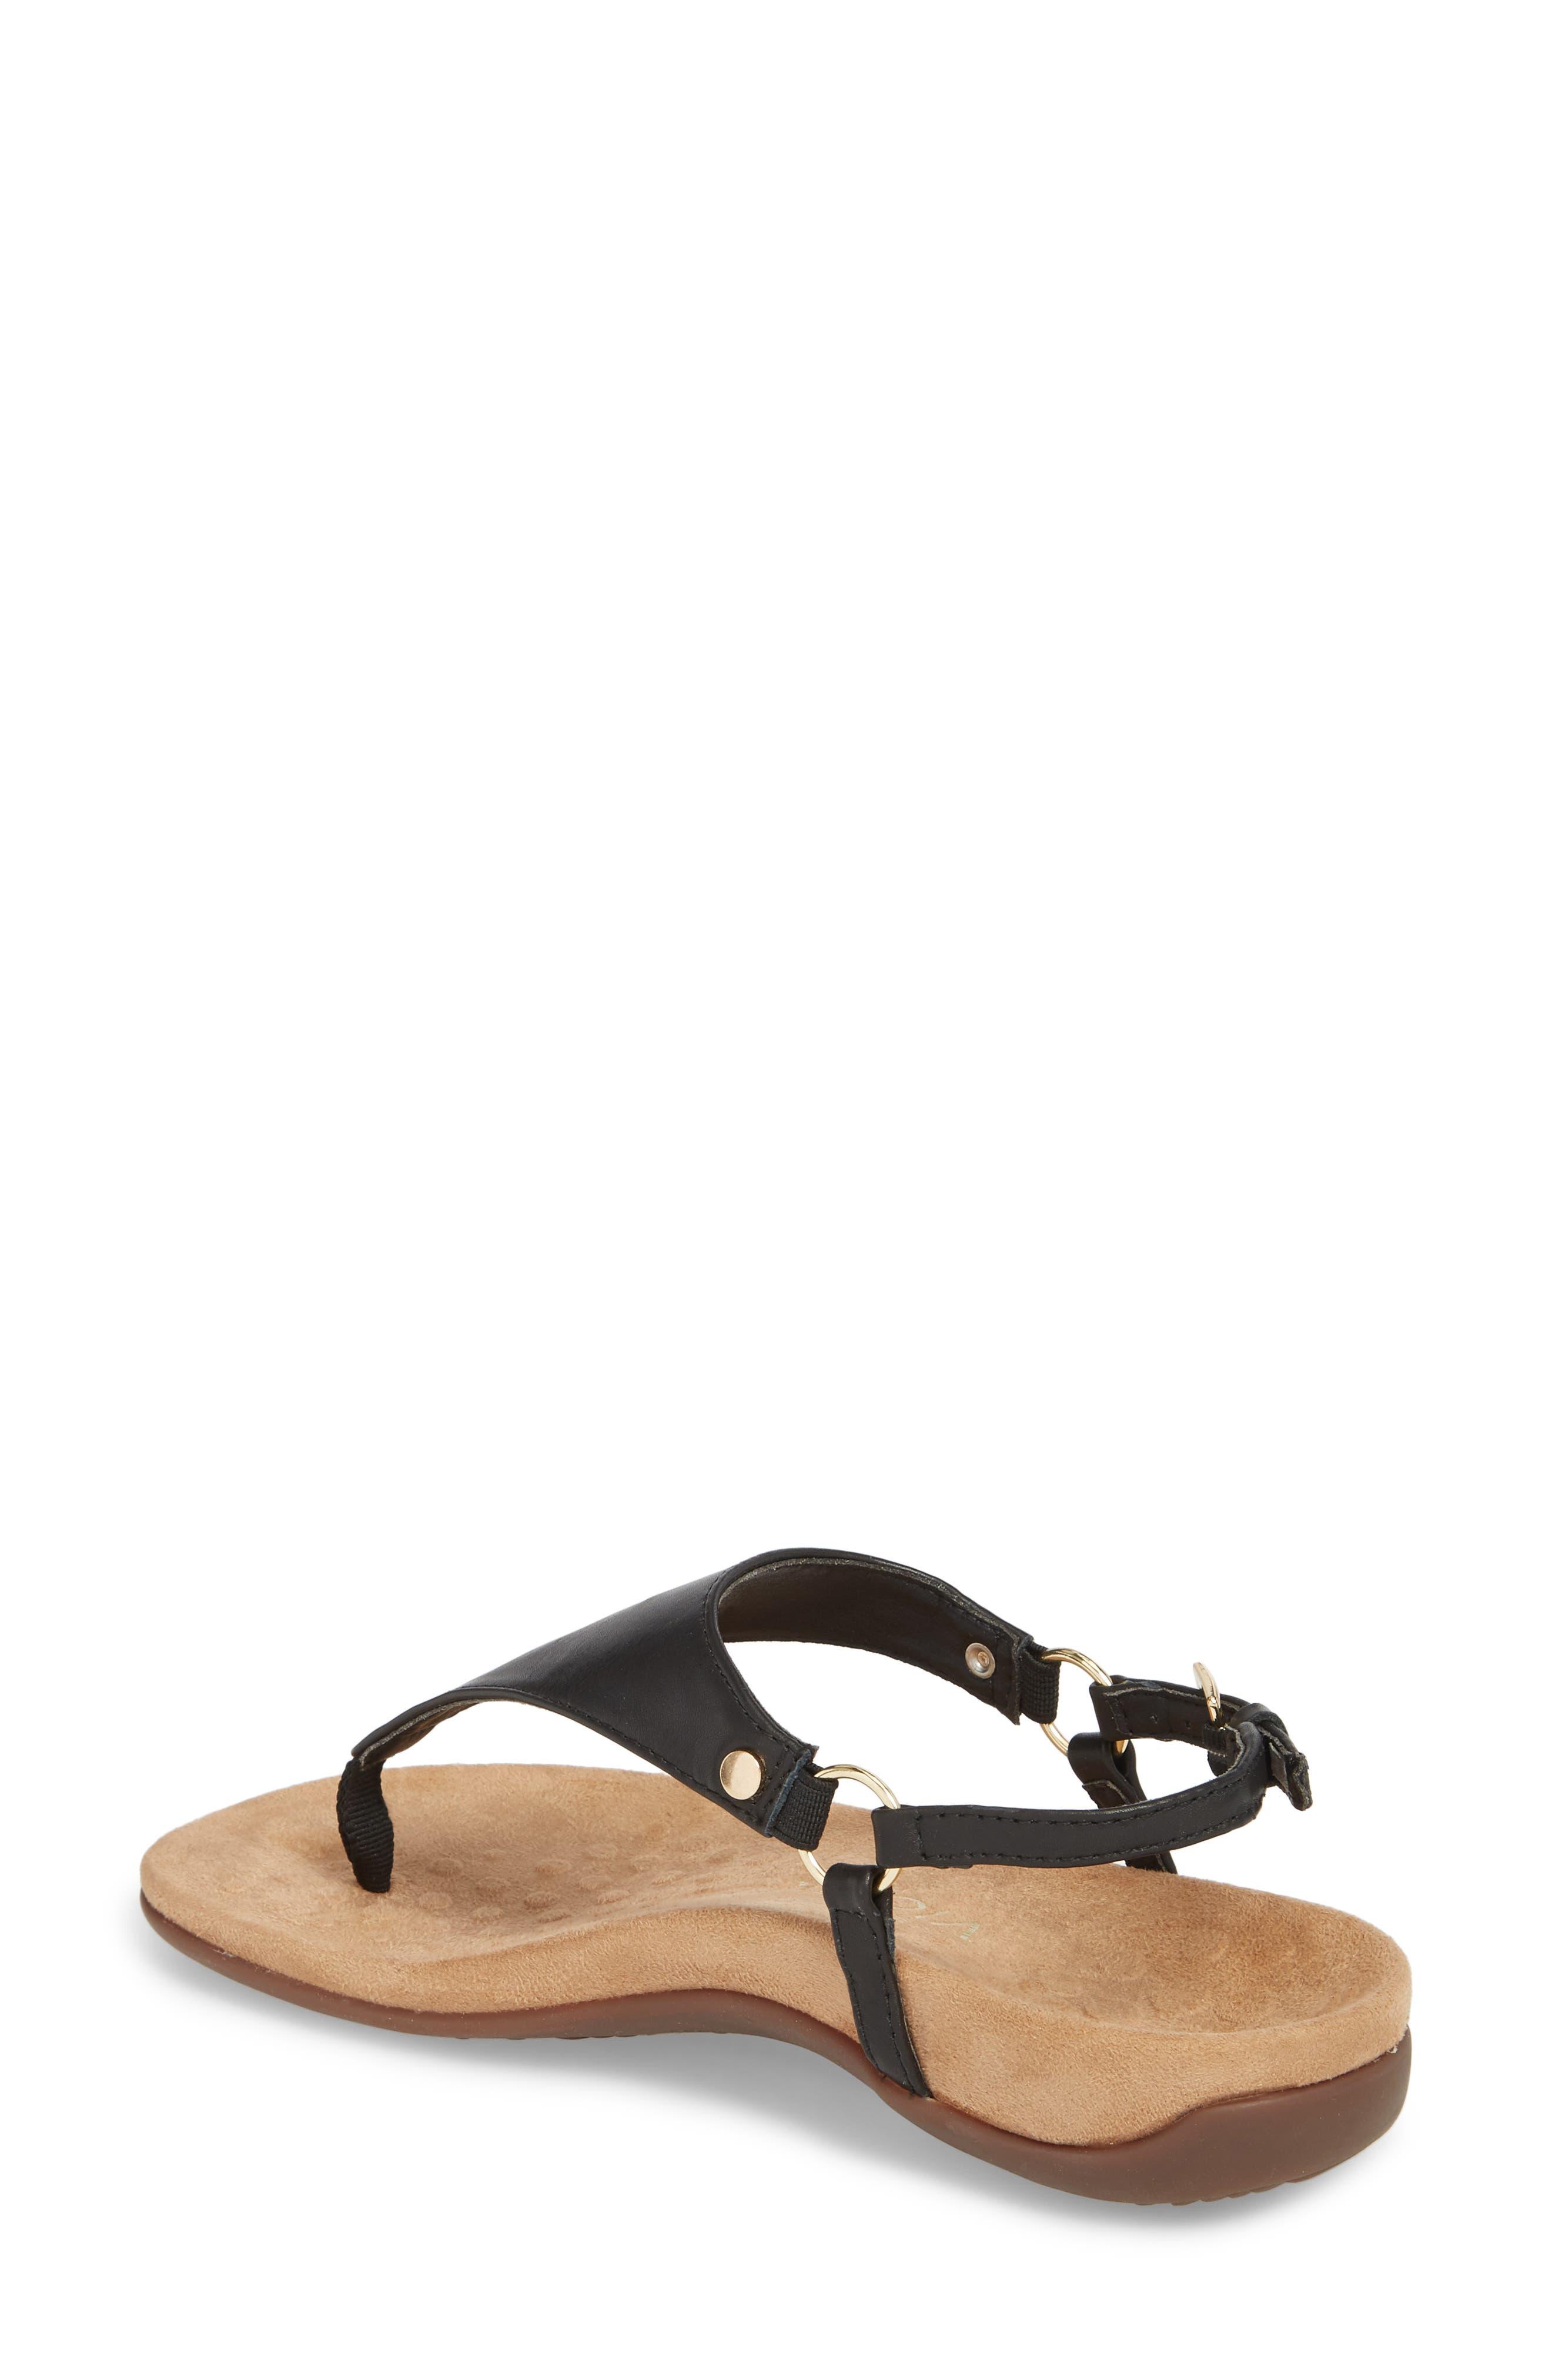 Kirra Orthaheel<sup>®</sup> Sandal,                             Alternate thumbnail 2, color,                             Black Leather